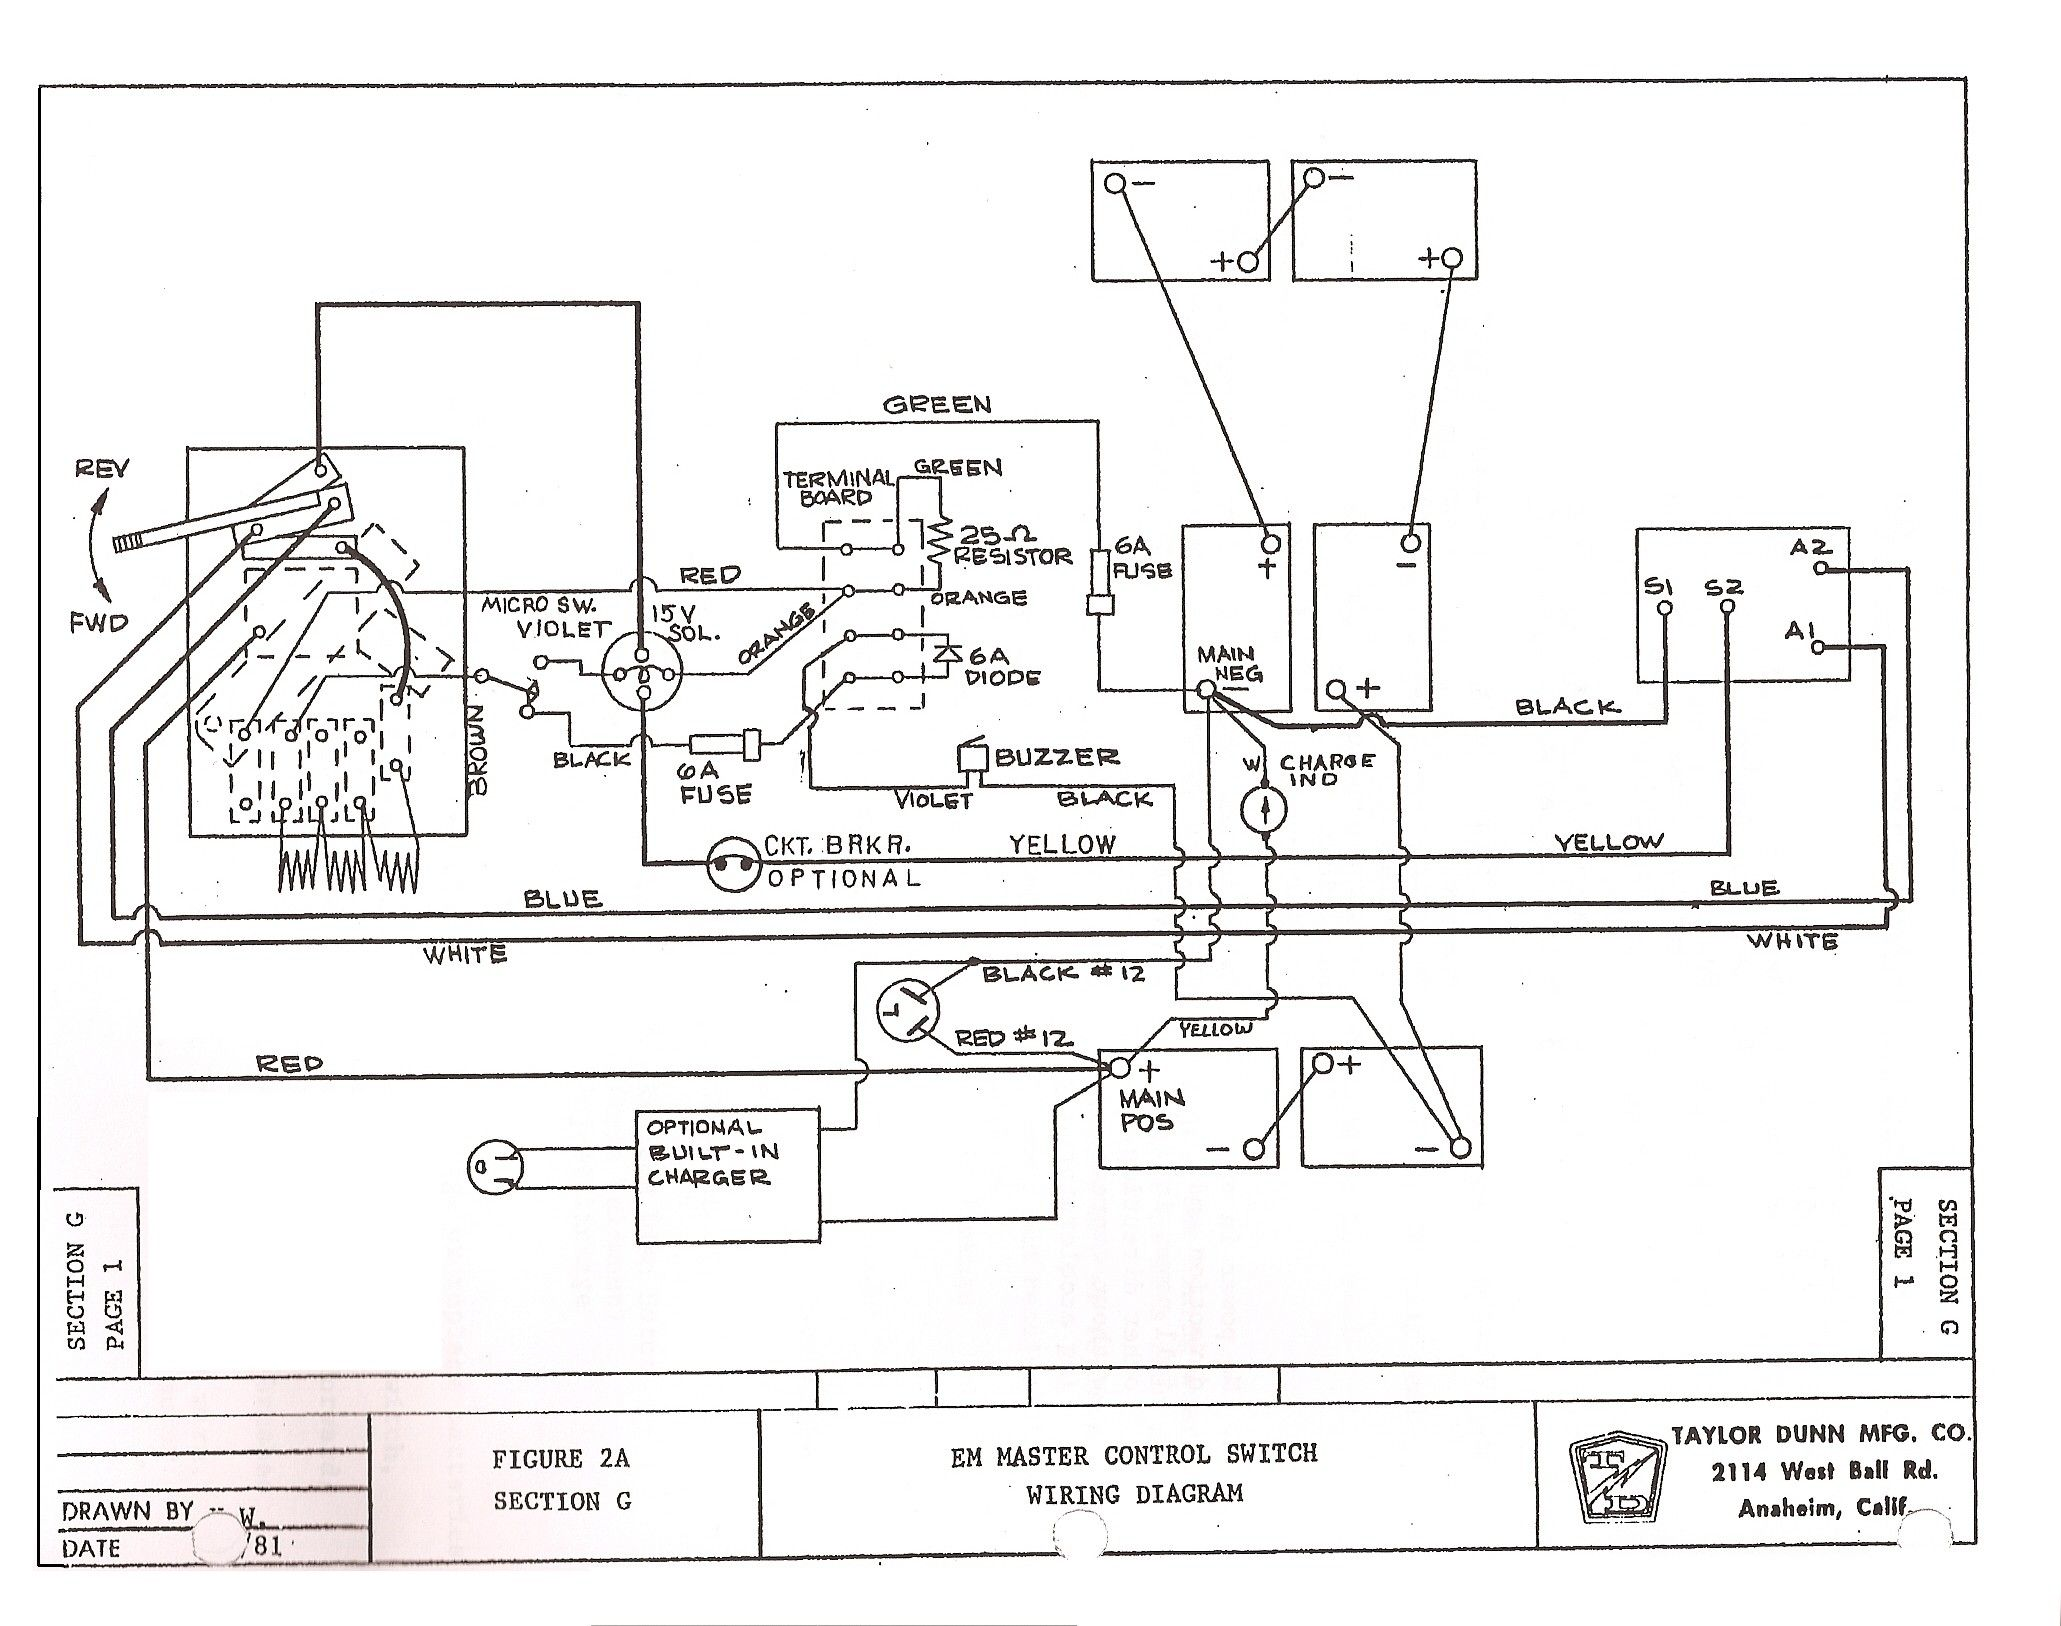 Unique Wiring Diagram for 1987 Club Car Golf Cart